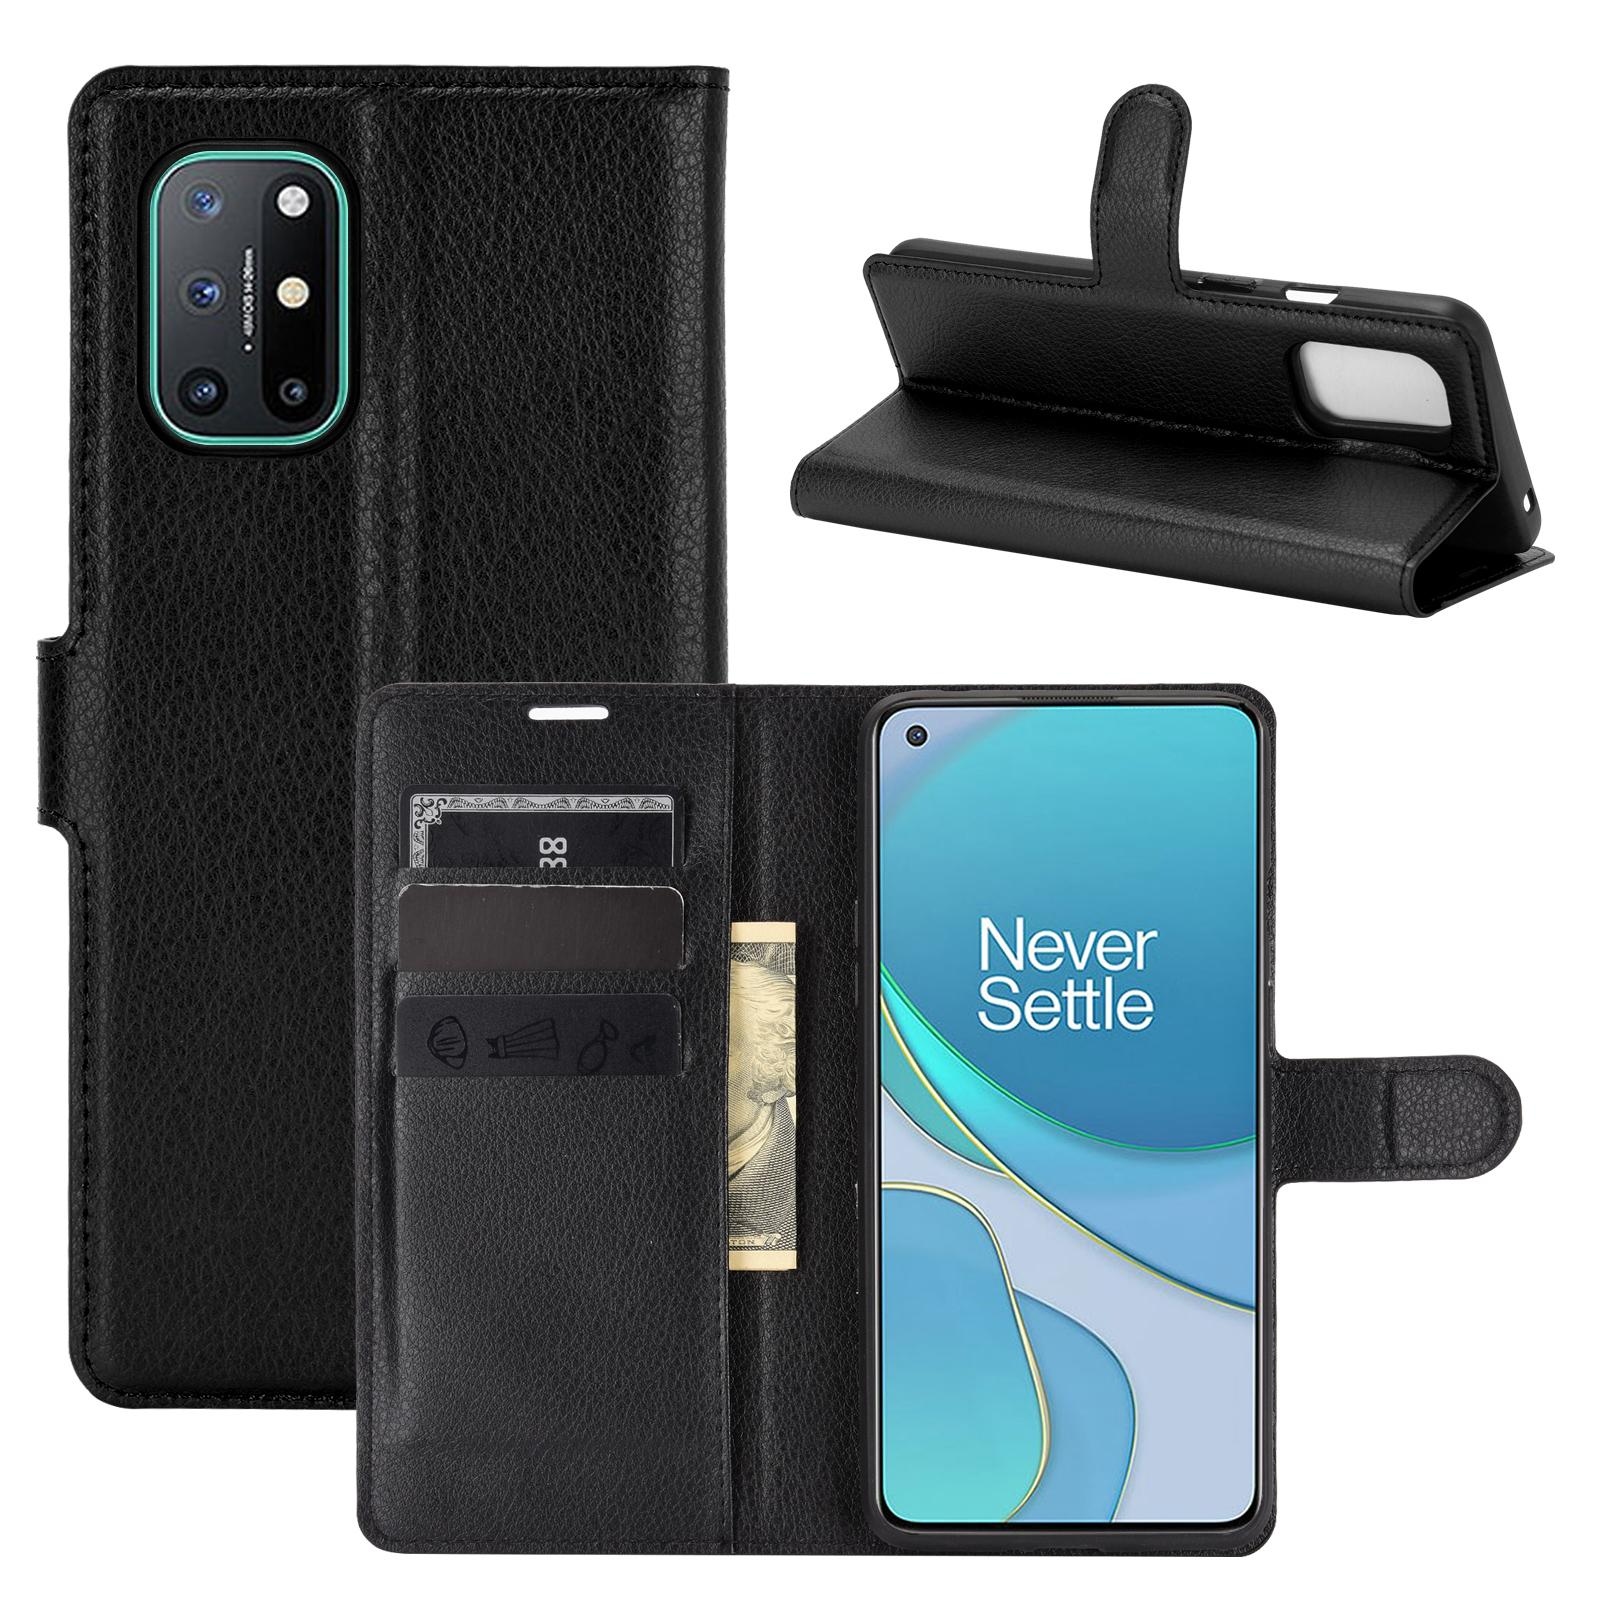 Mobilveske OnePlus 8T svart